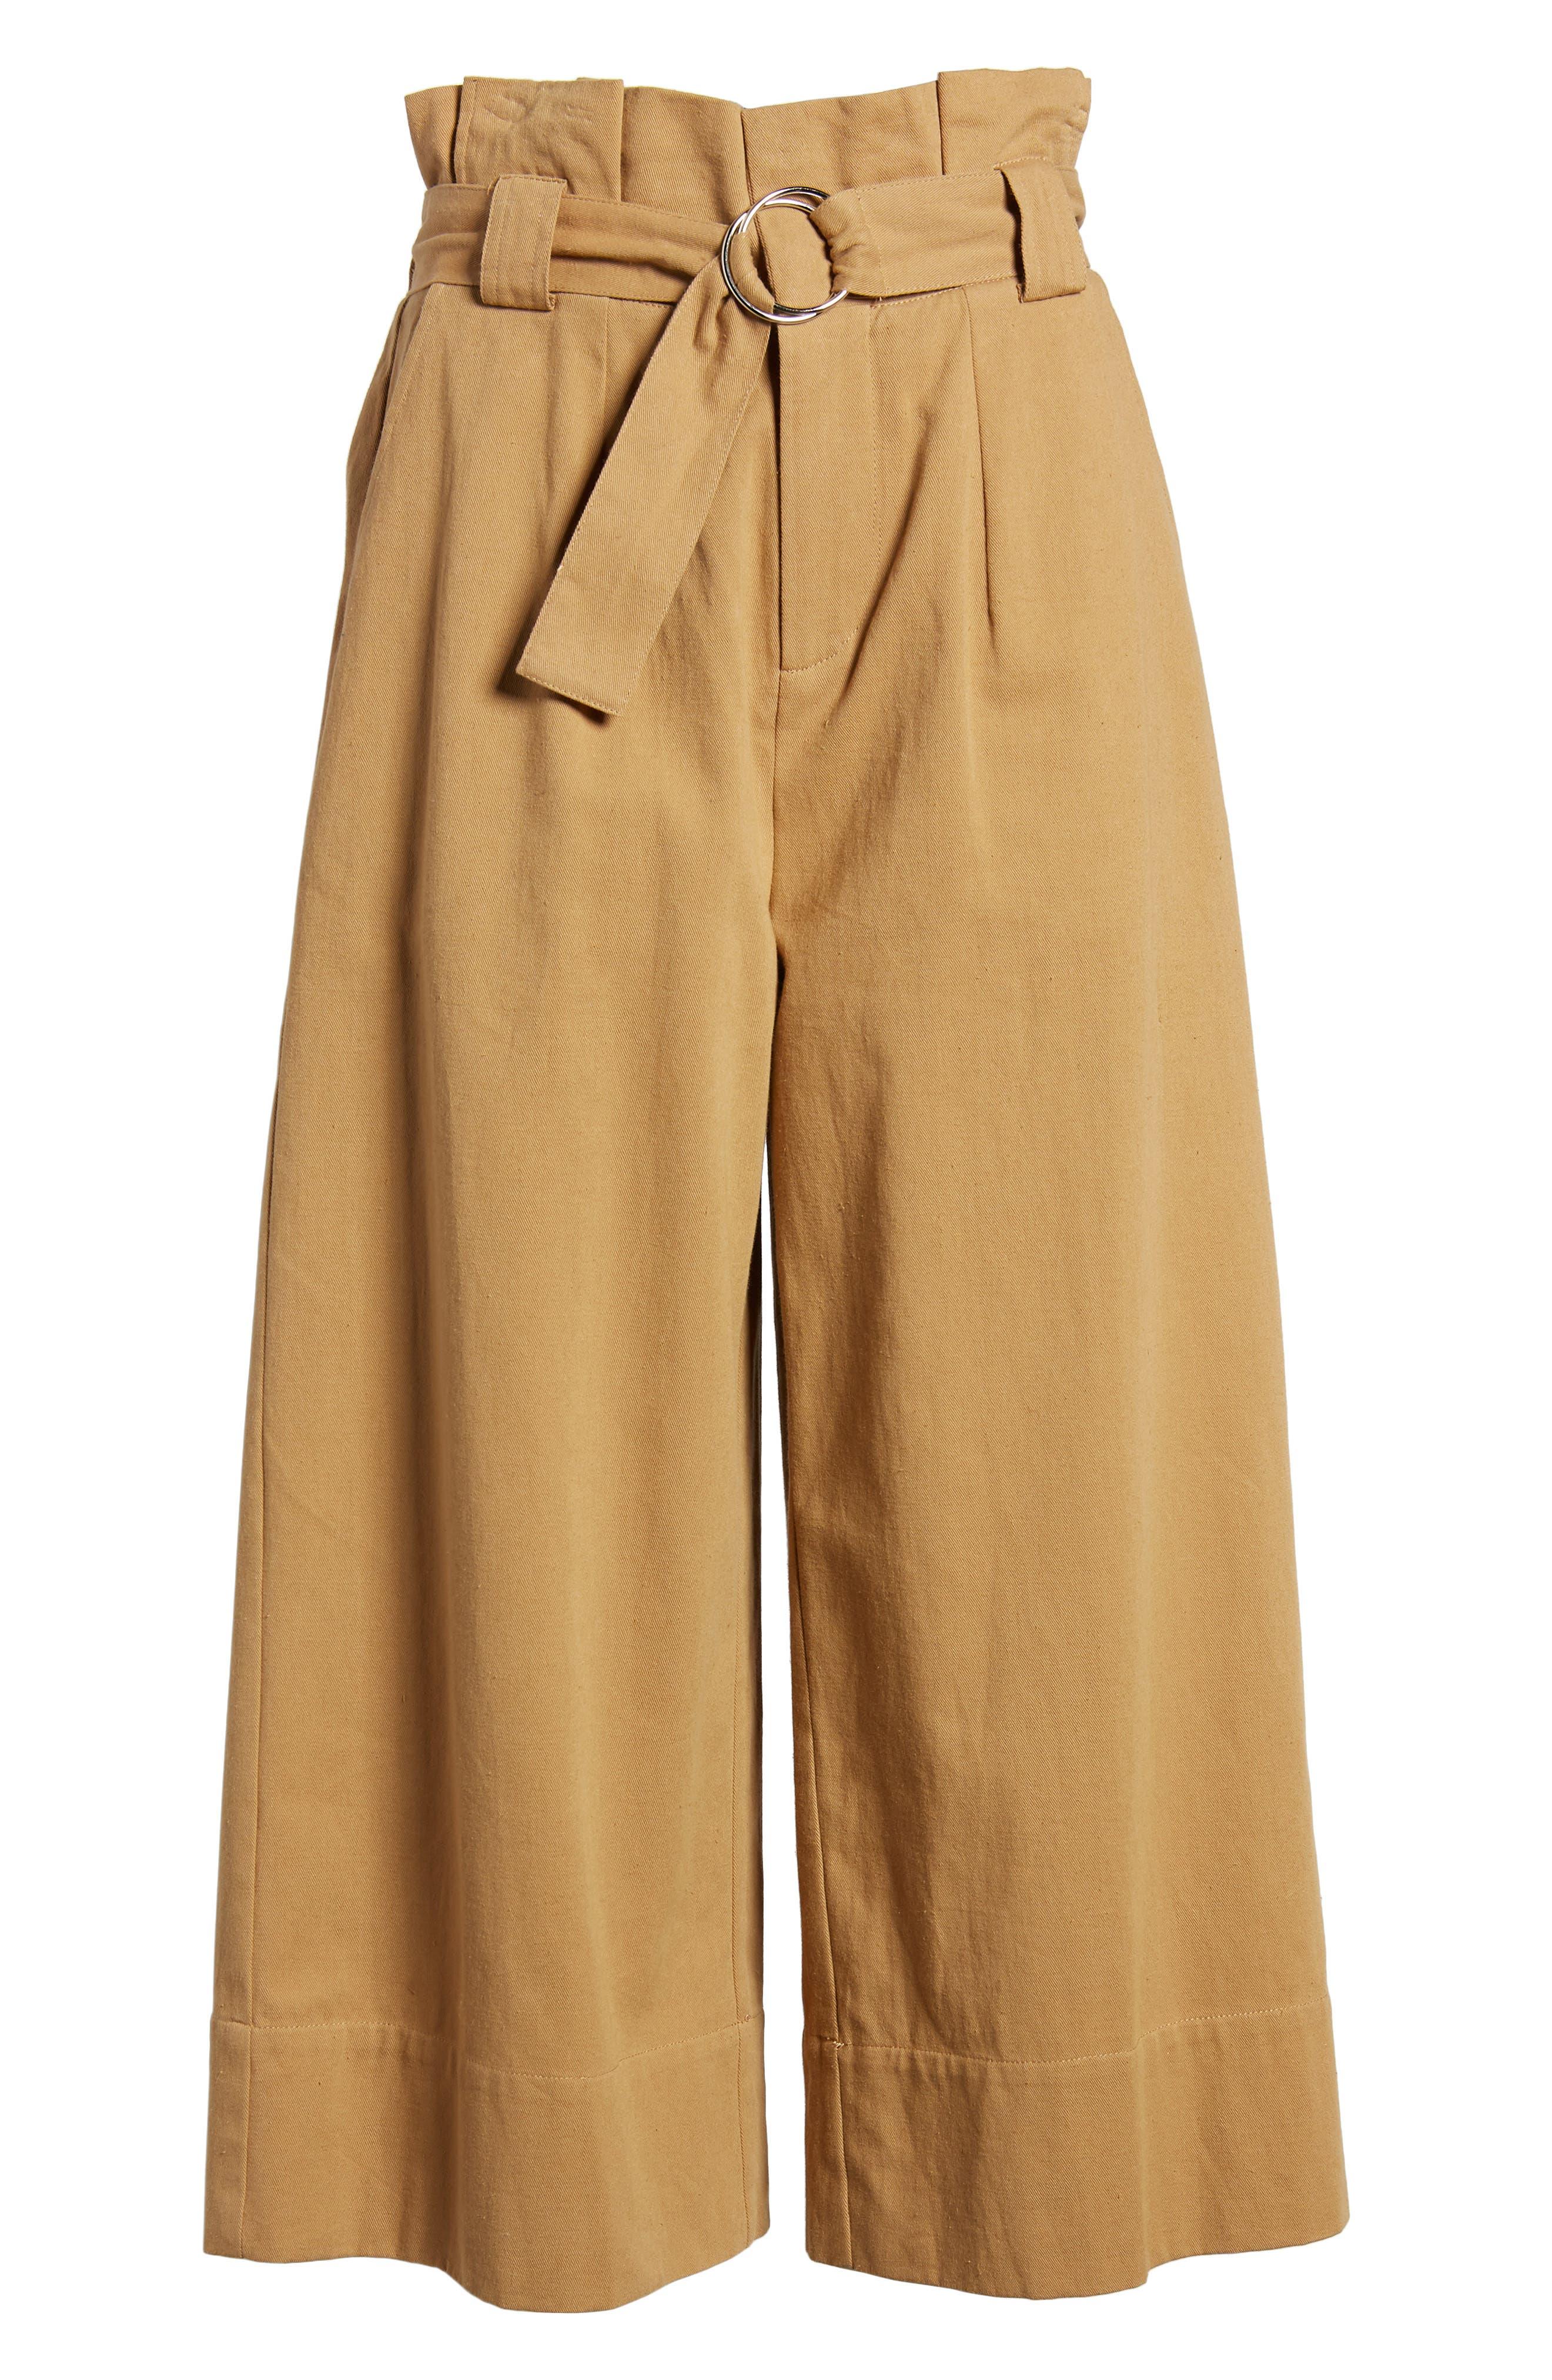 Paperbag Waist Crop Pants,                             Alternate thumbnail 6, color,                             250